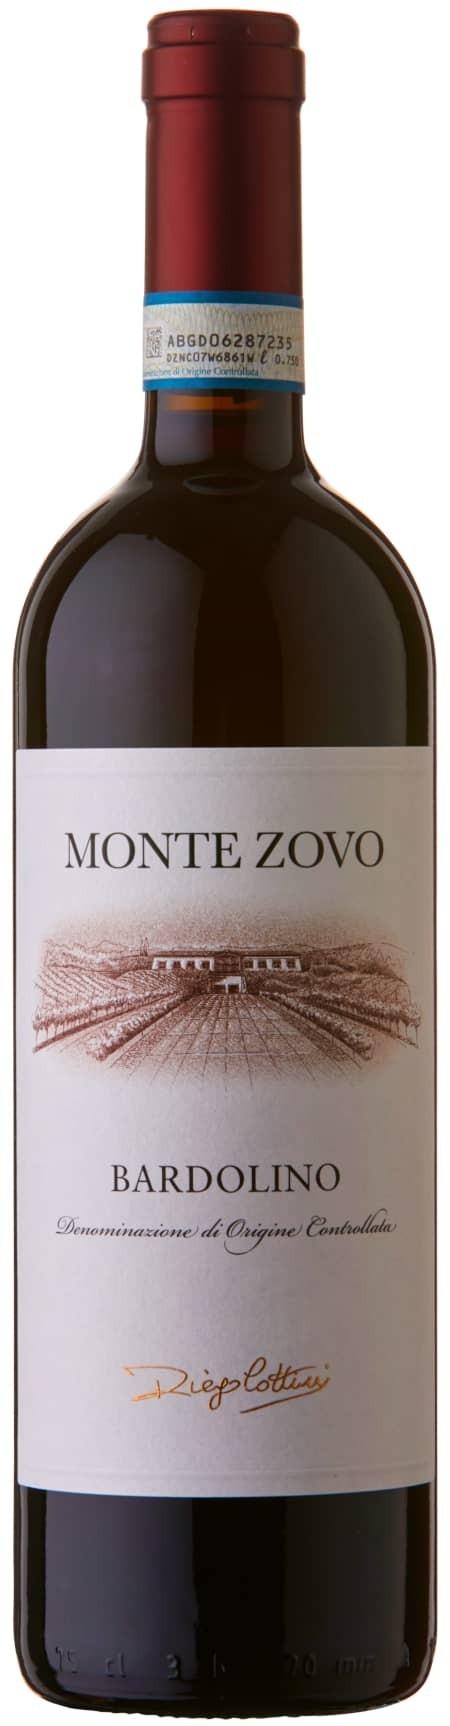 Monte Zovo Bardolino